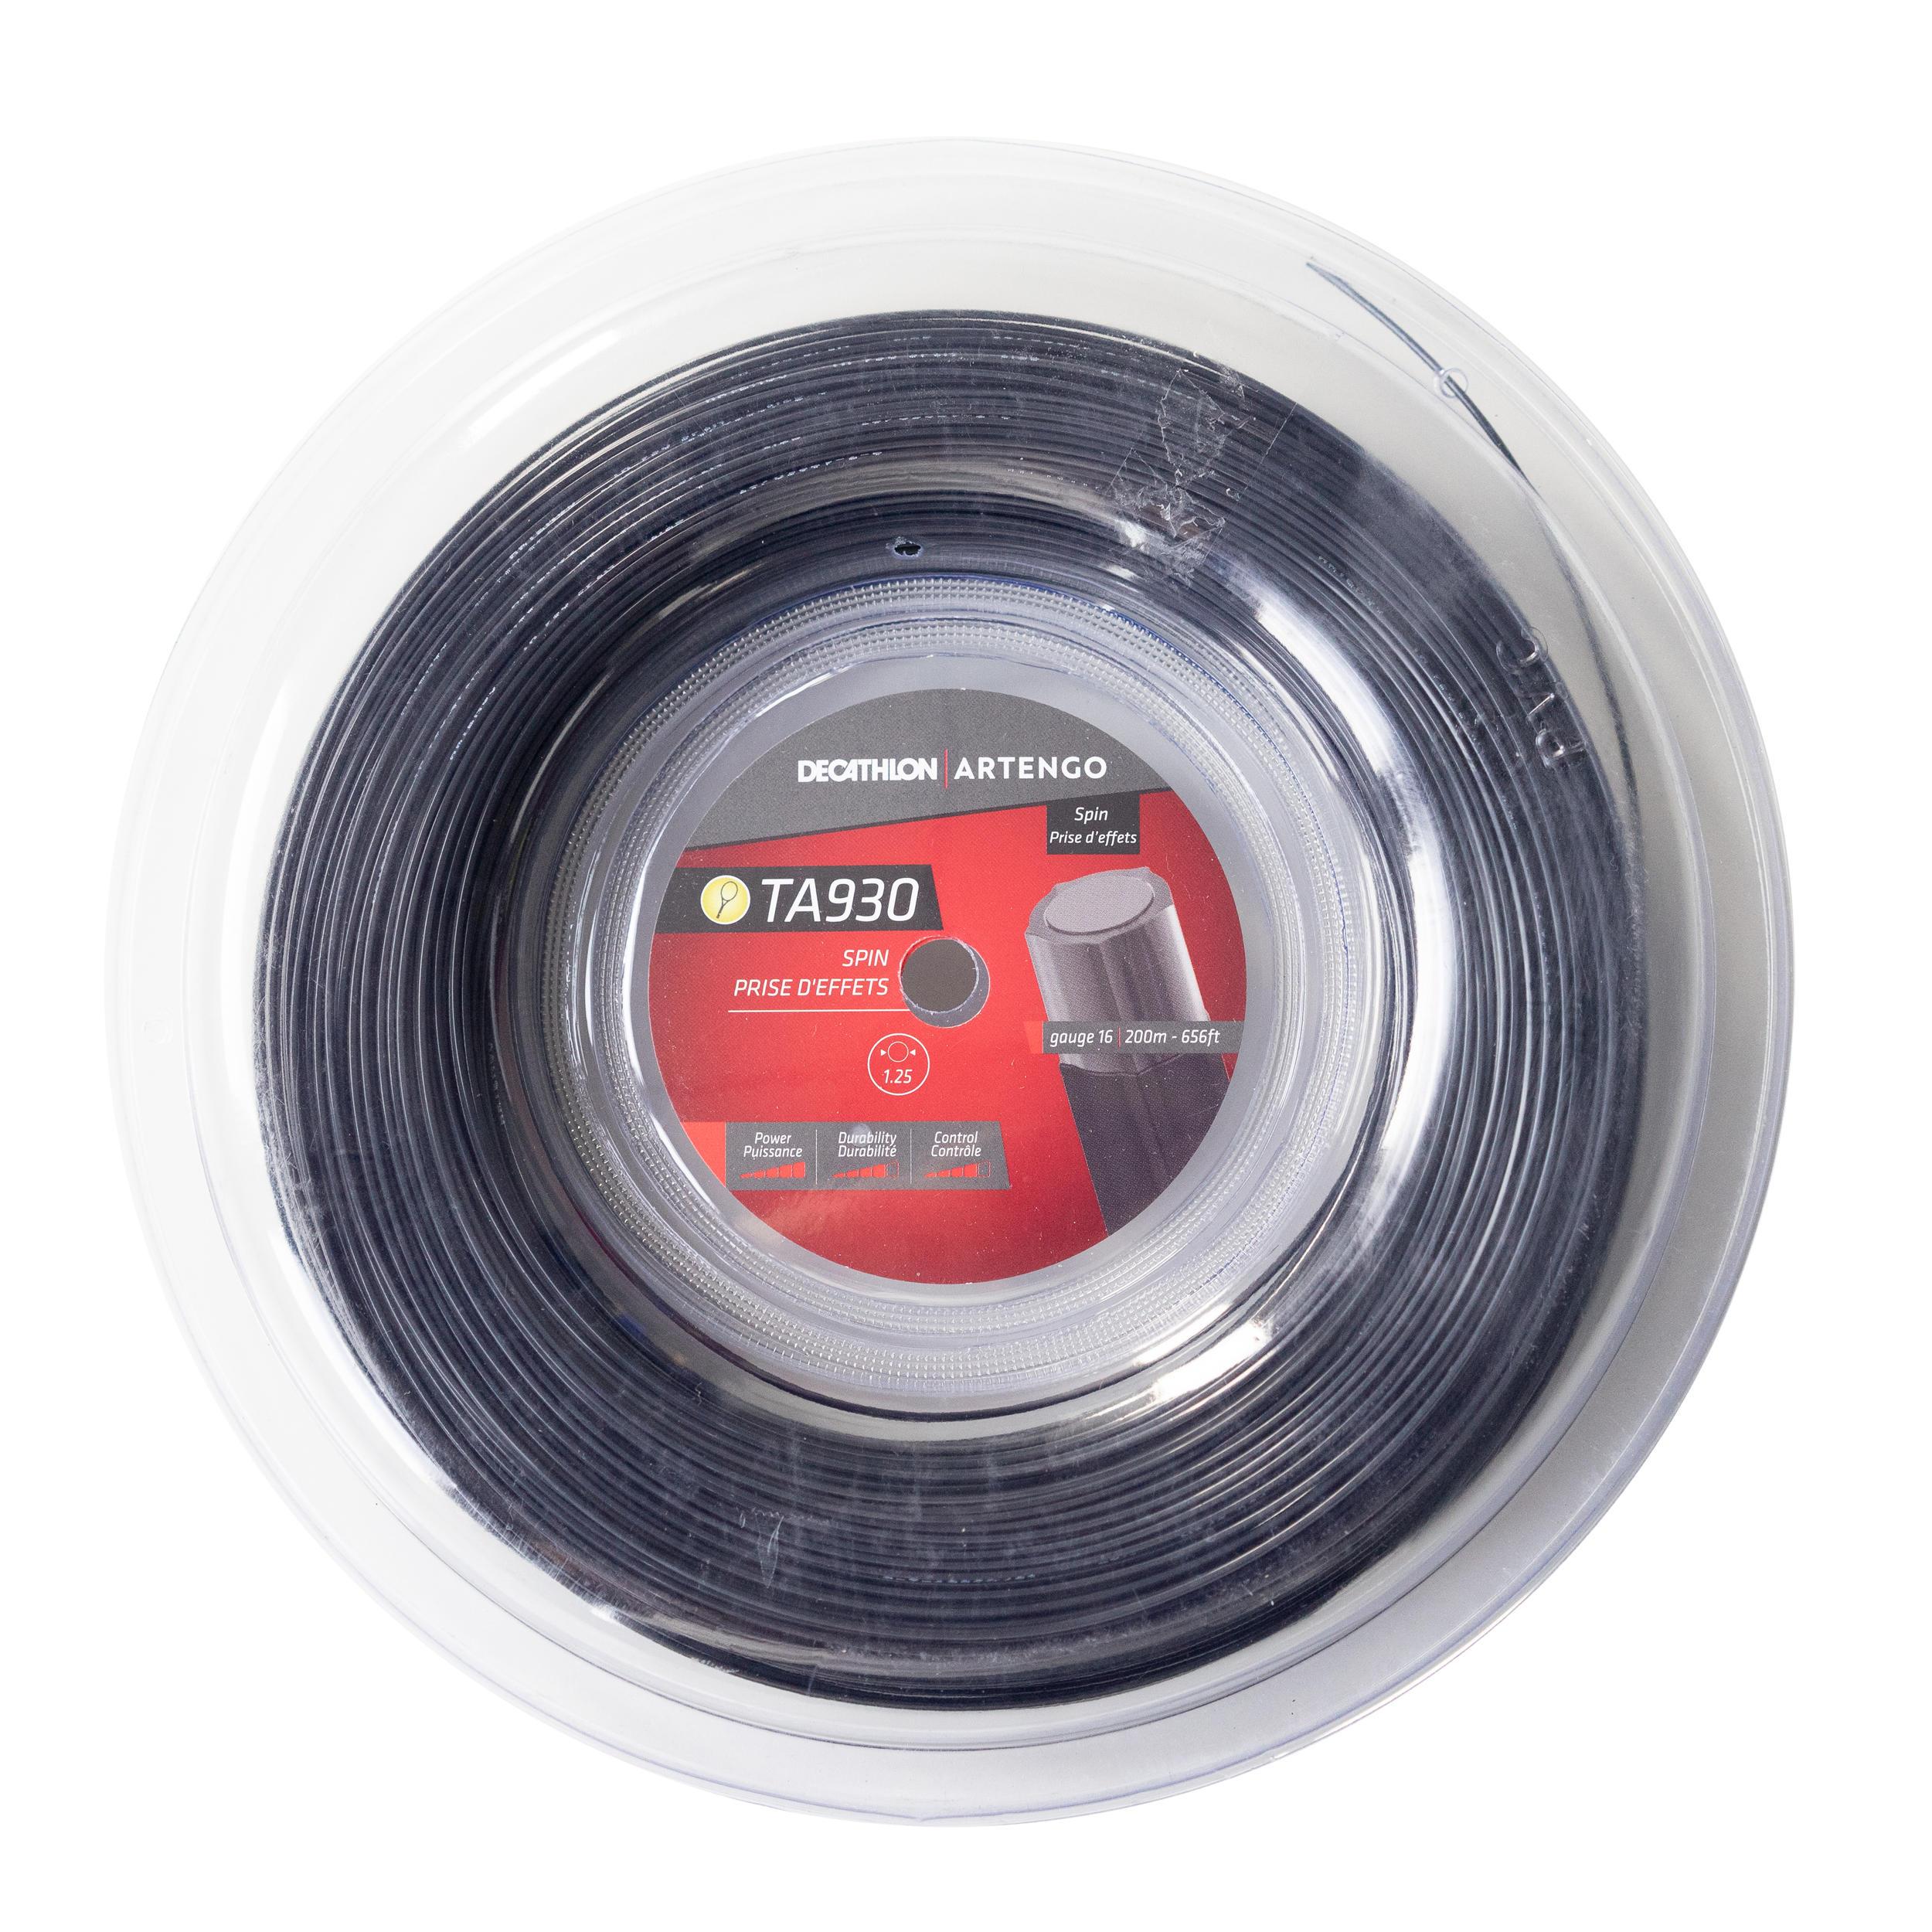 Cordaj Ta930 Spin Roll imagine